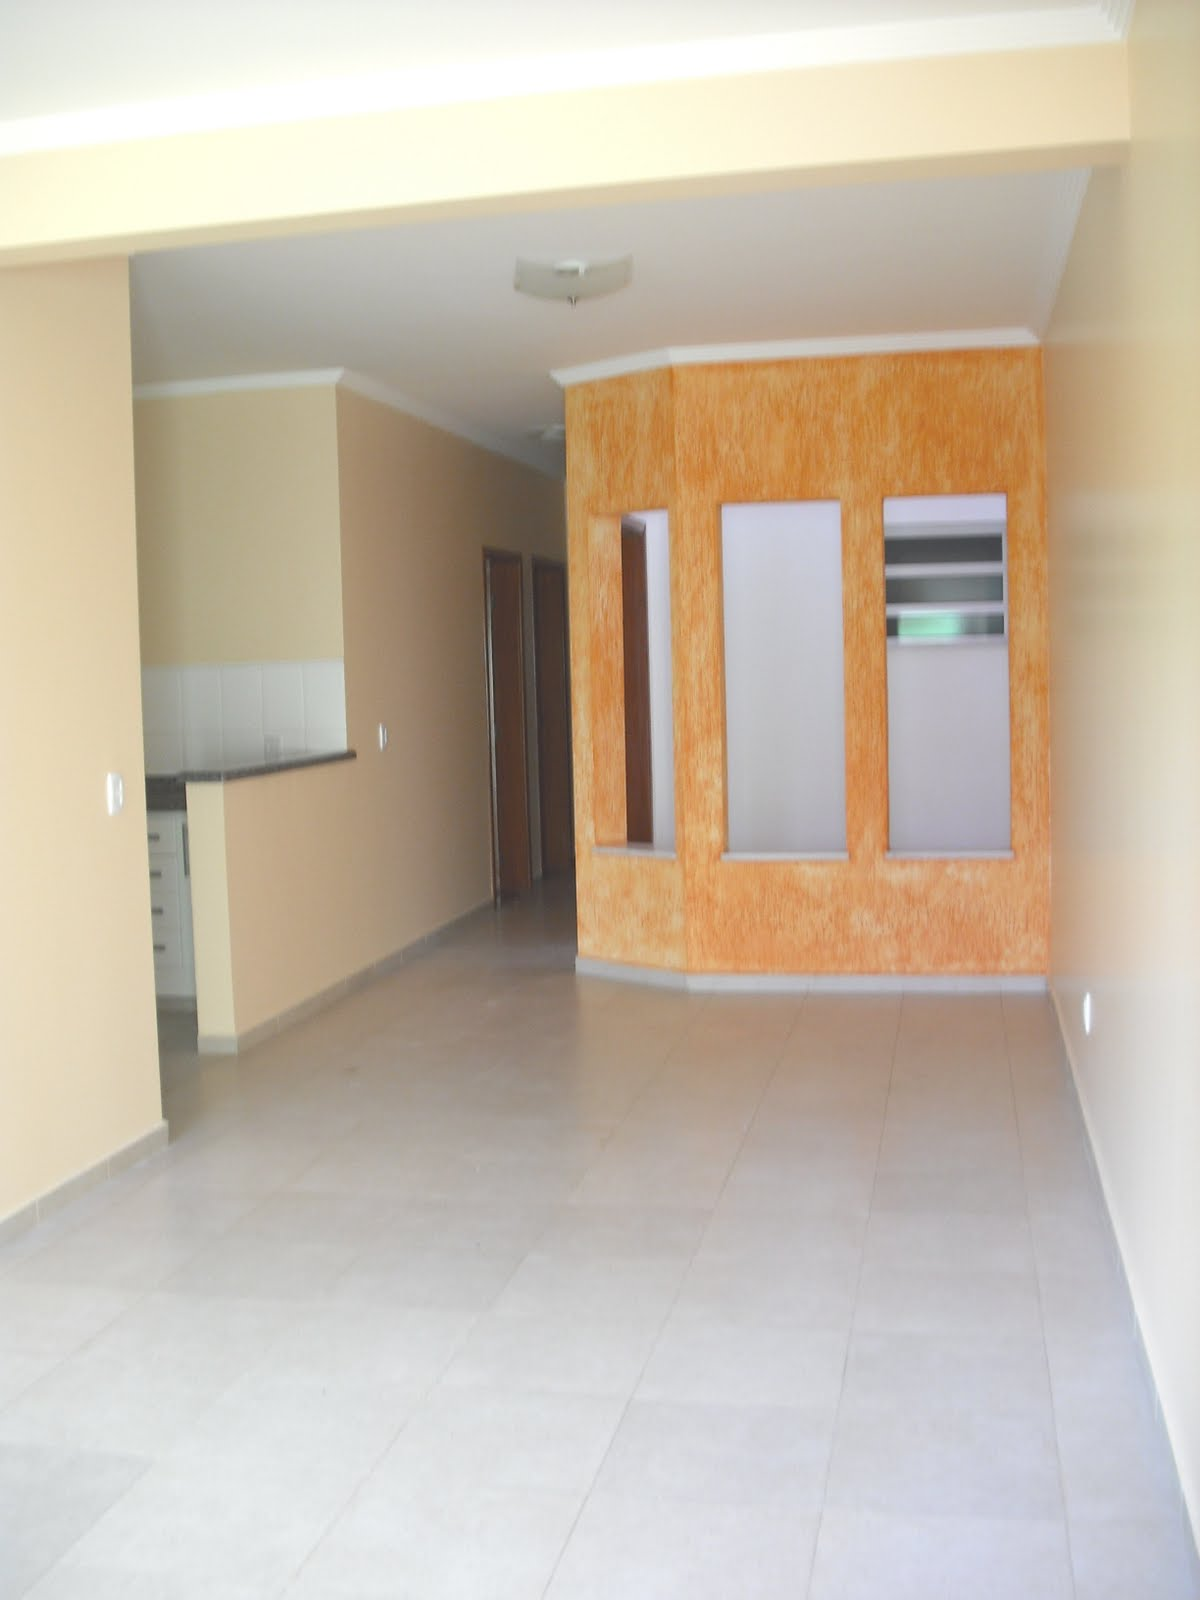 #9A6631 DE NEGÓCIOS: Sala Piso porcelanato 3 ambs janela de vidro  236 Janelas De Vidro Para Sala